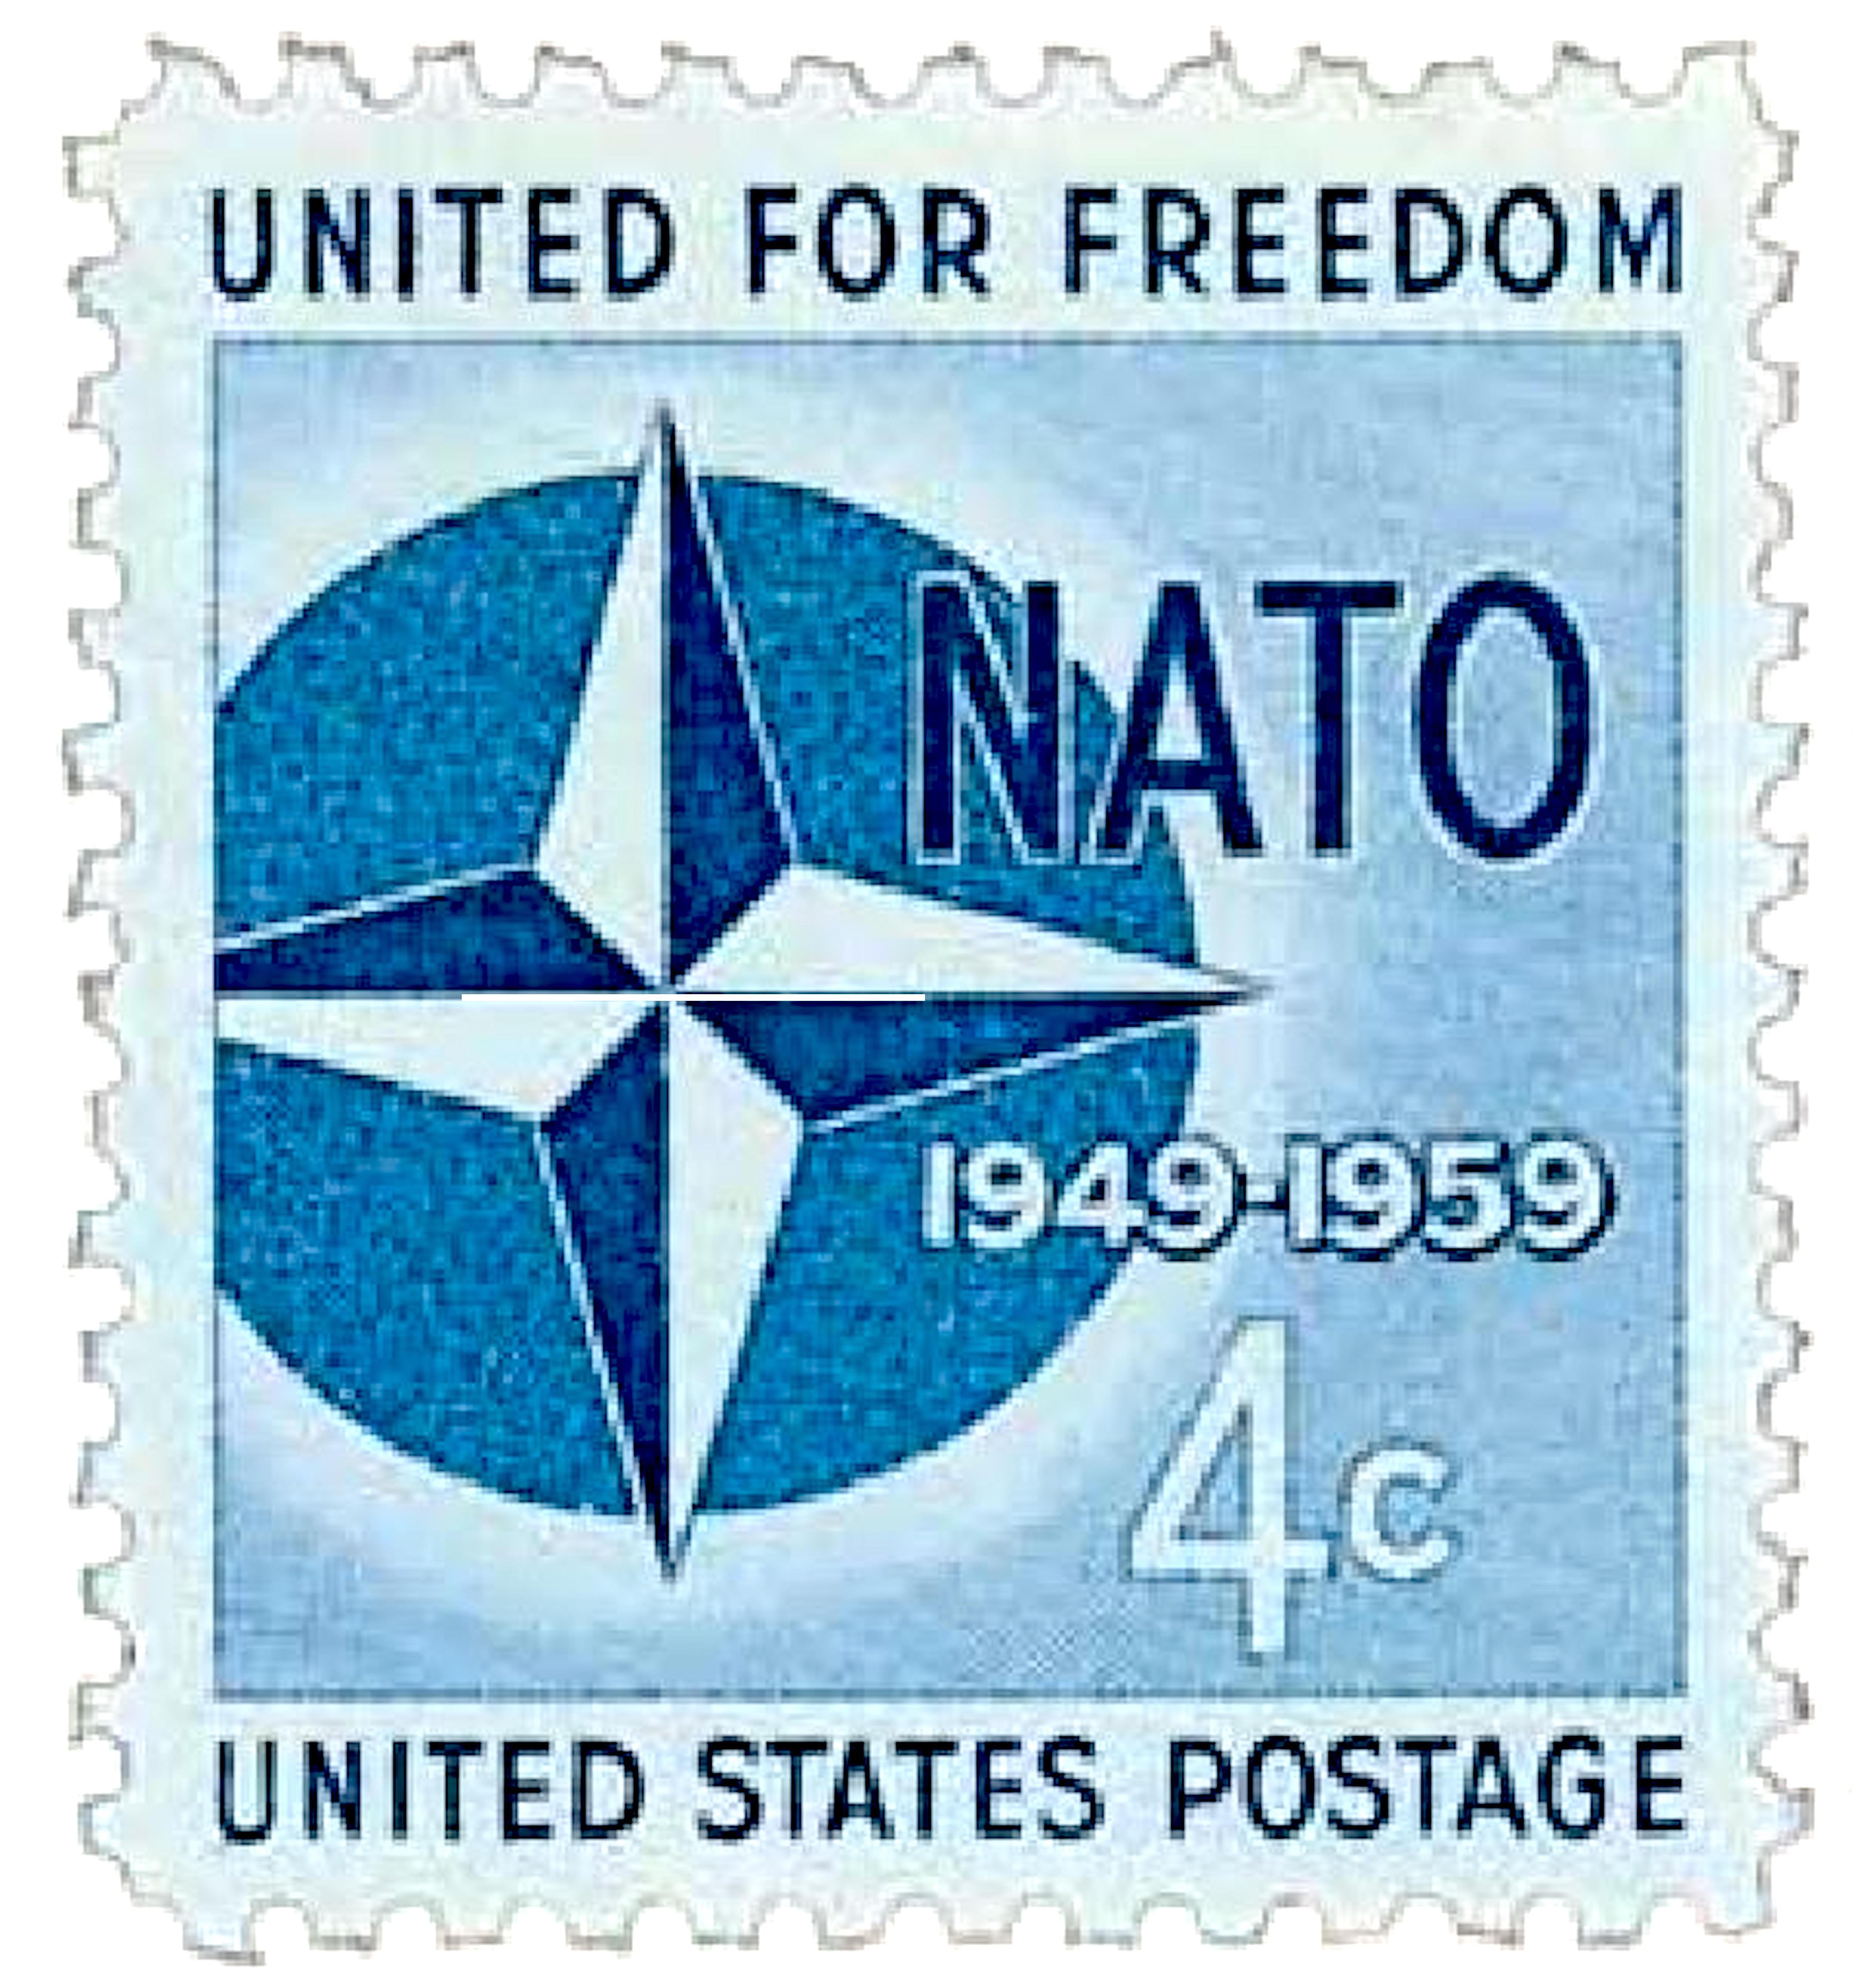 United for freedom United States Postage (foto Etsy)